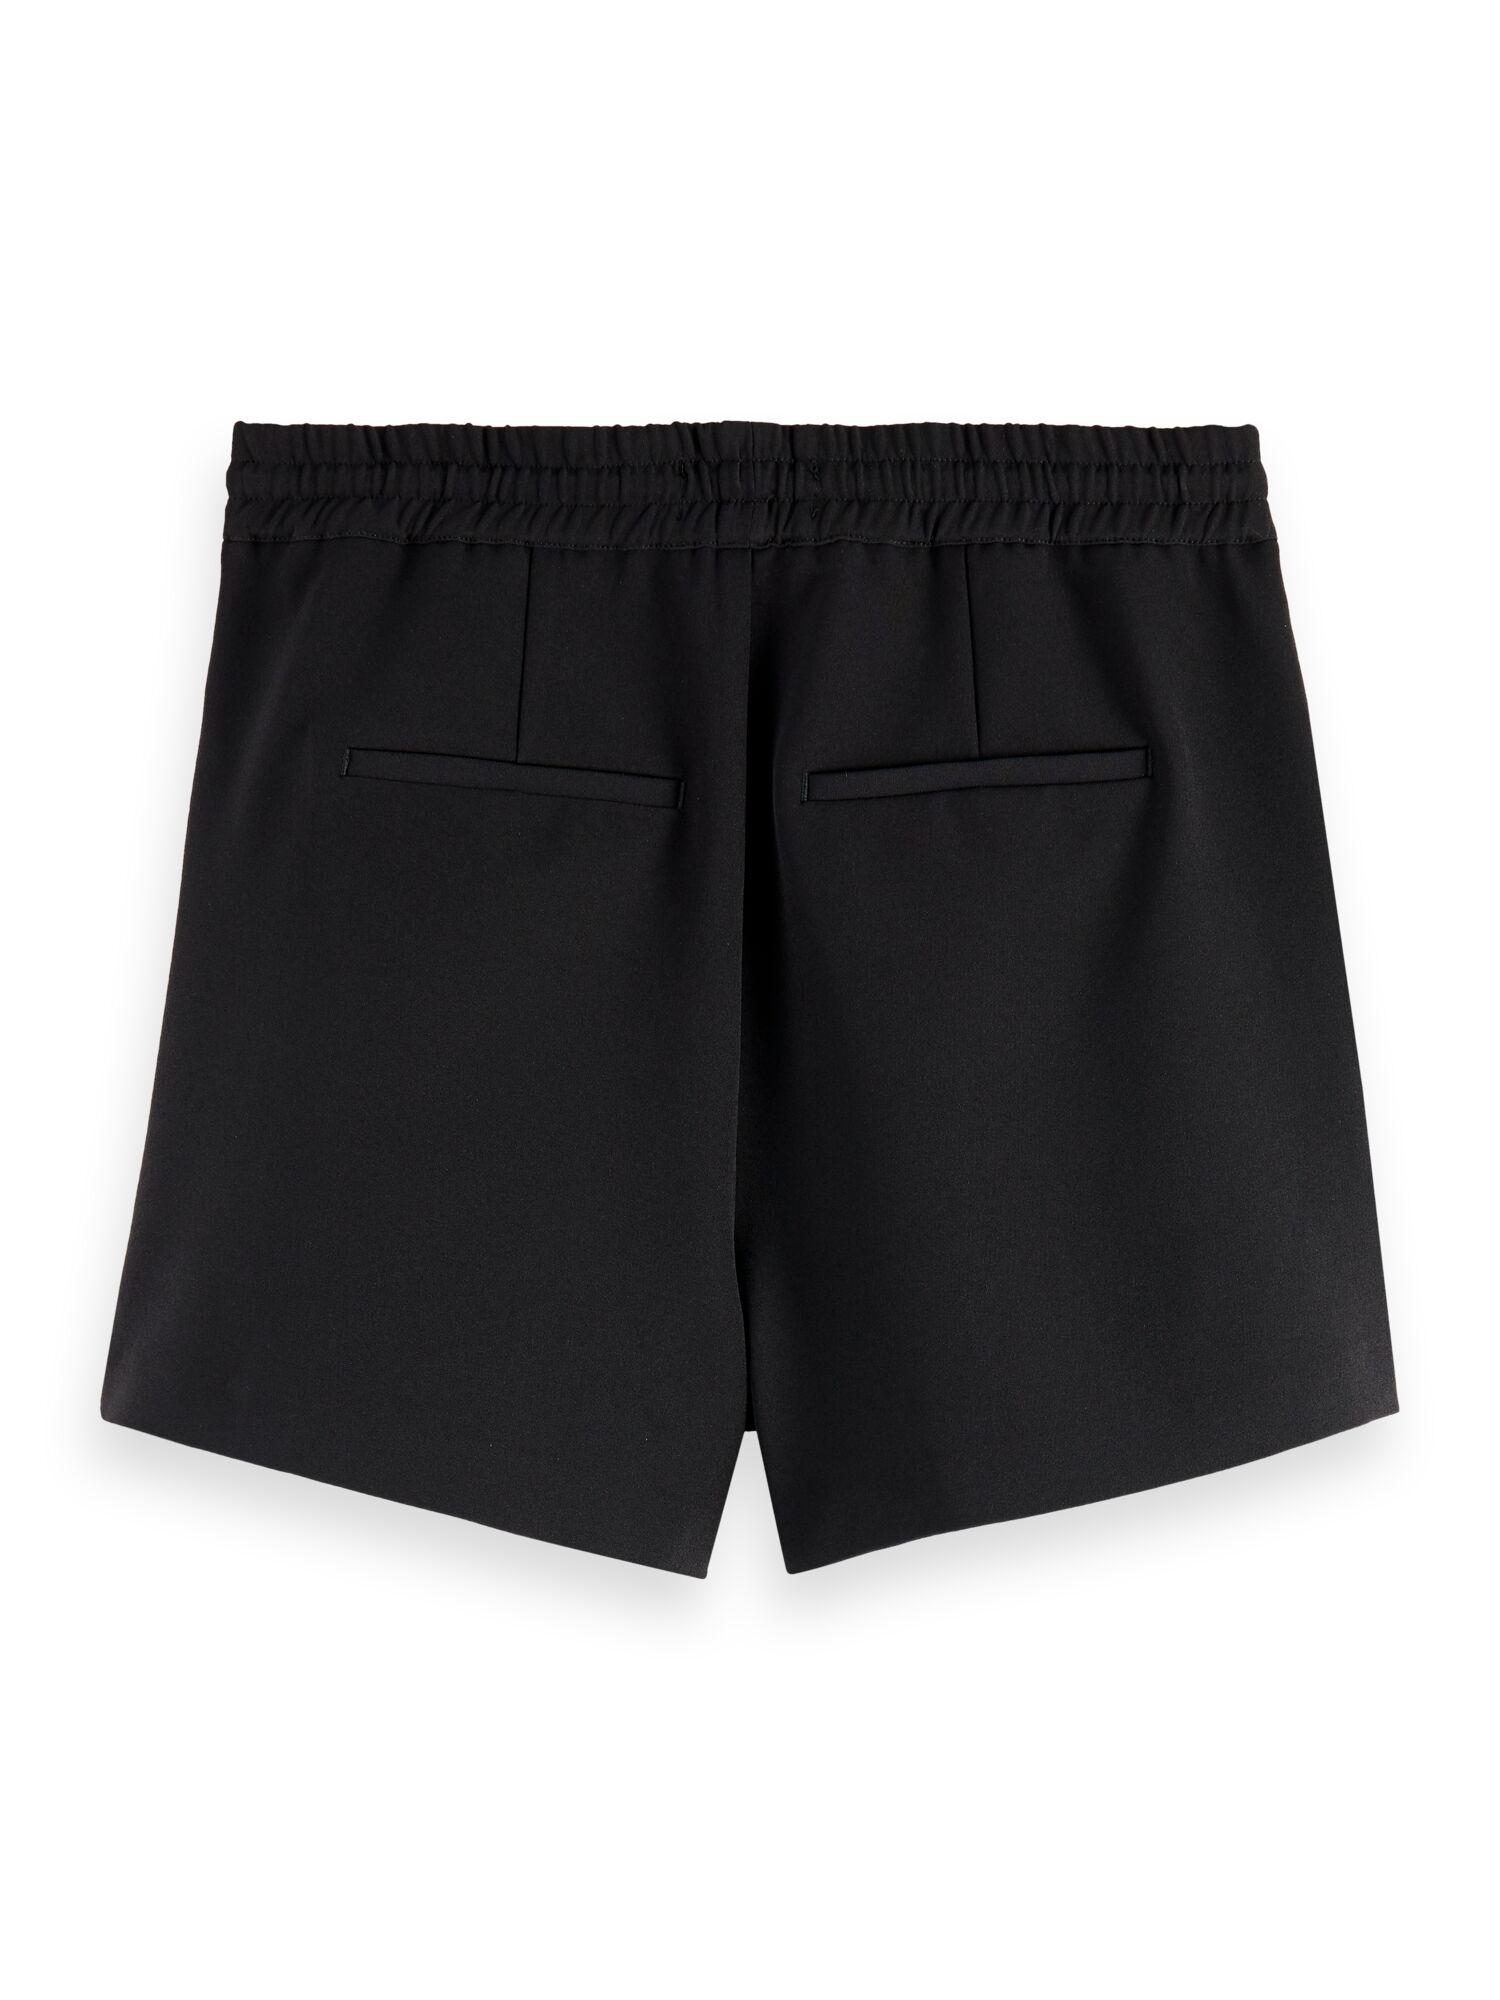 Scotch & Soda | Clean jogger shorts